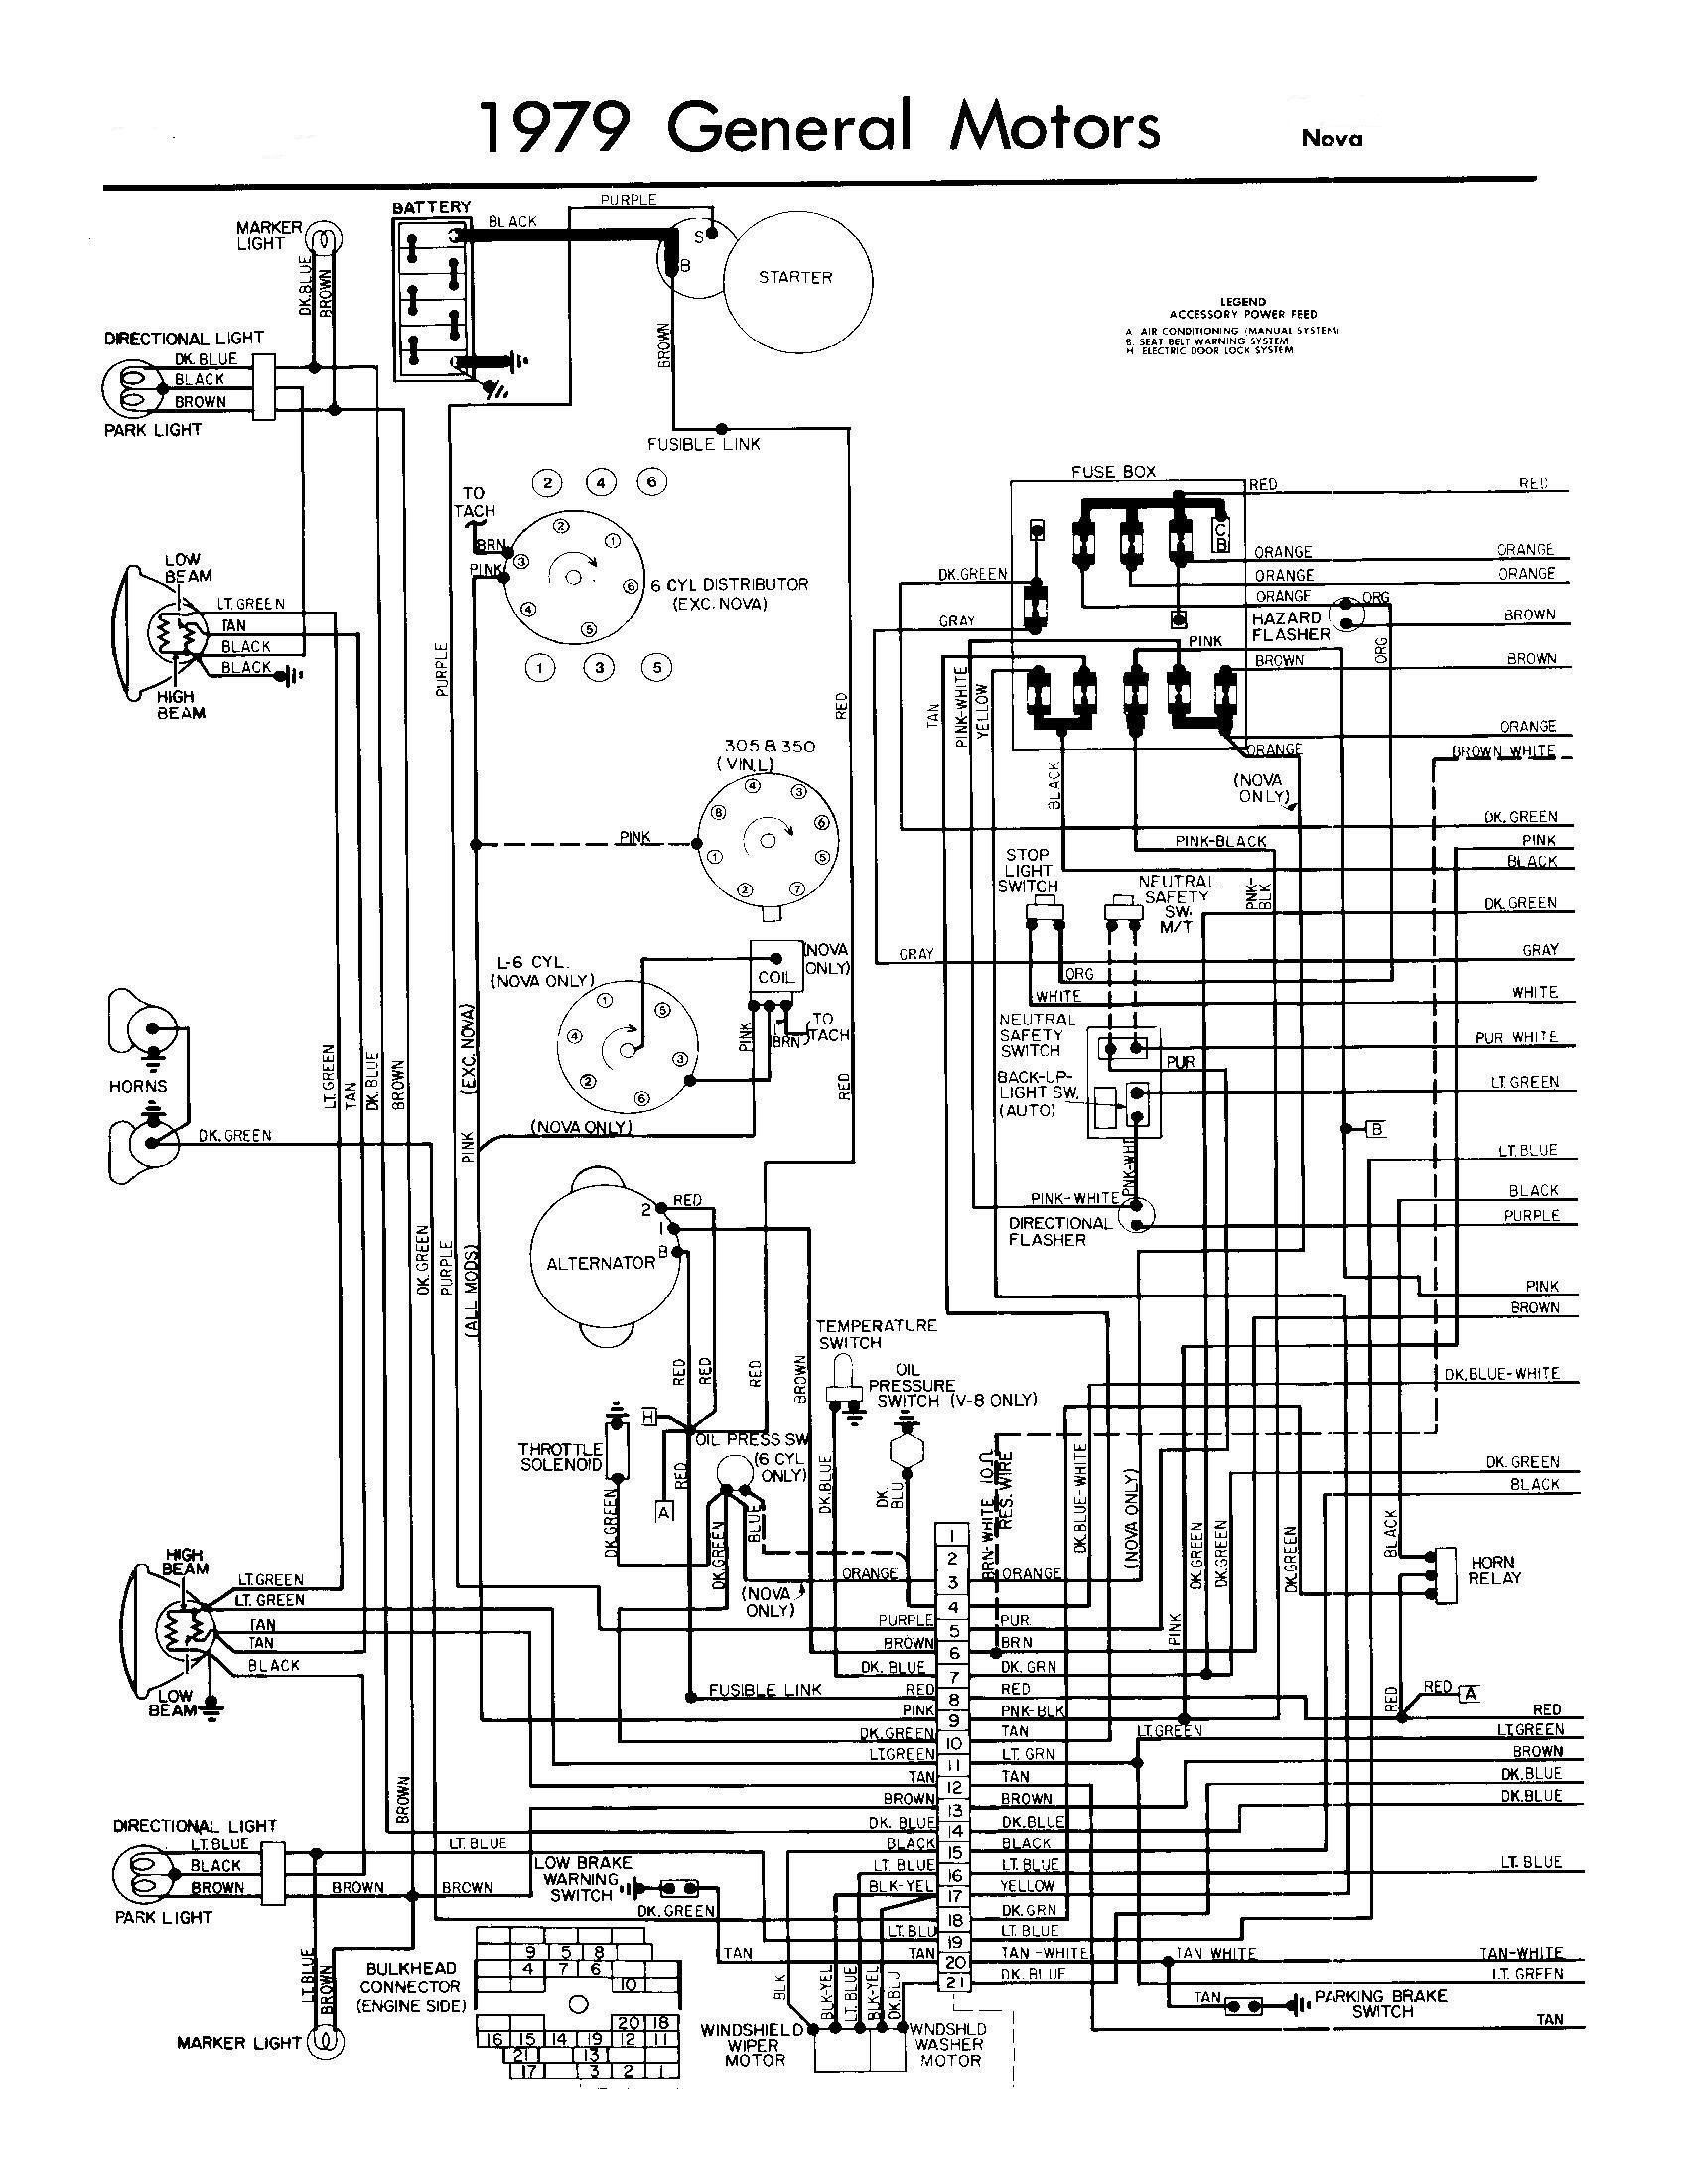 79 Chevy Truck Wiring Diagram Goldwing Trailer All Generation Schematics Nova Forum Custom